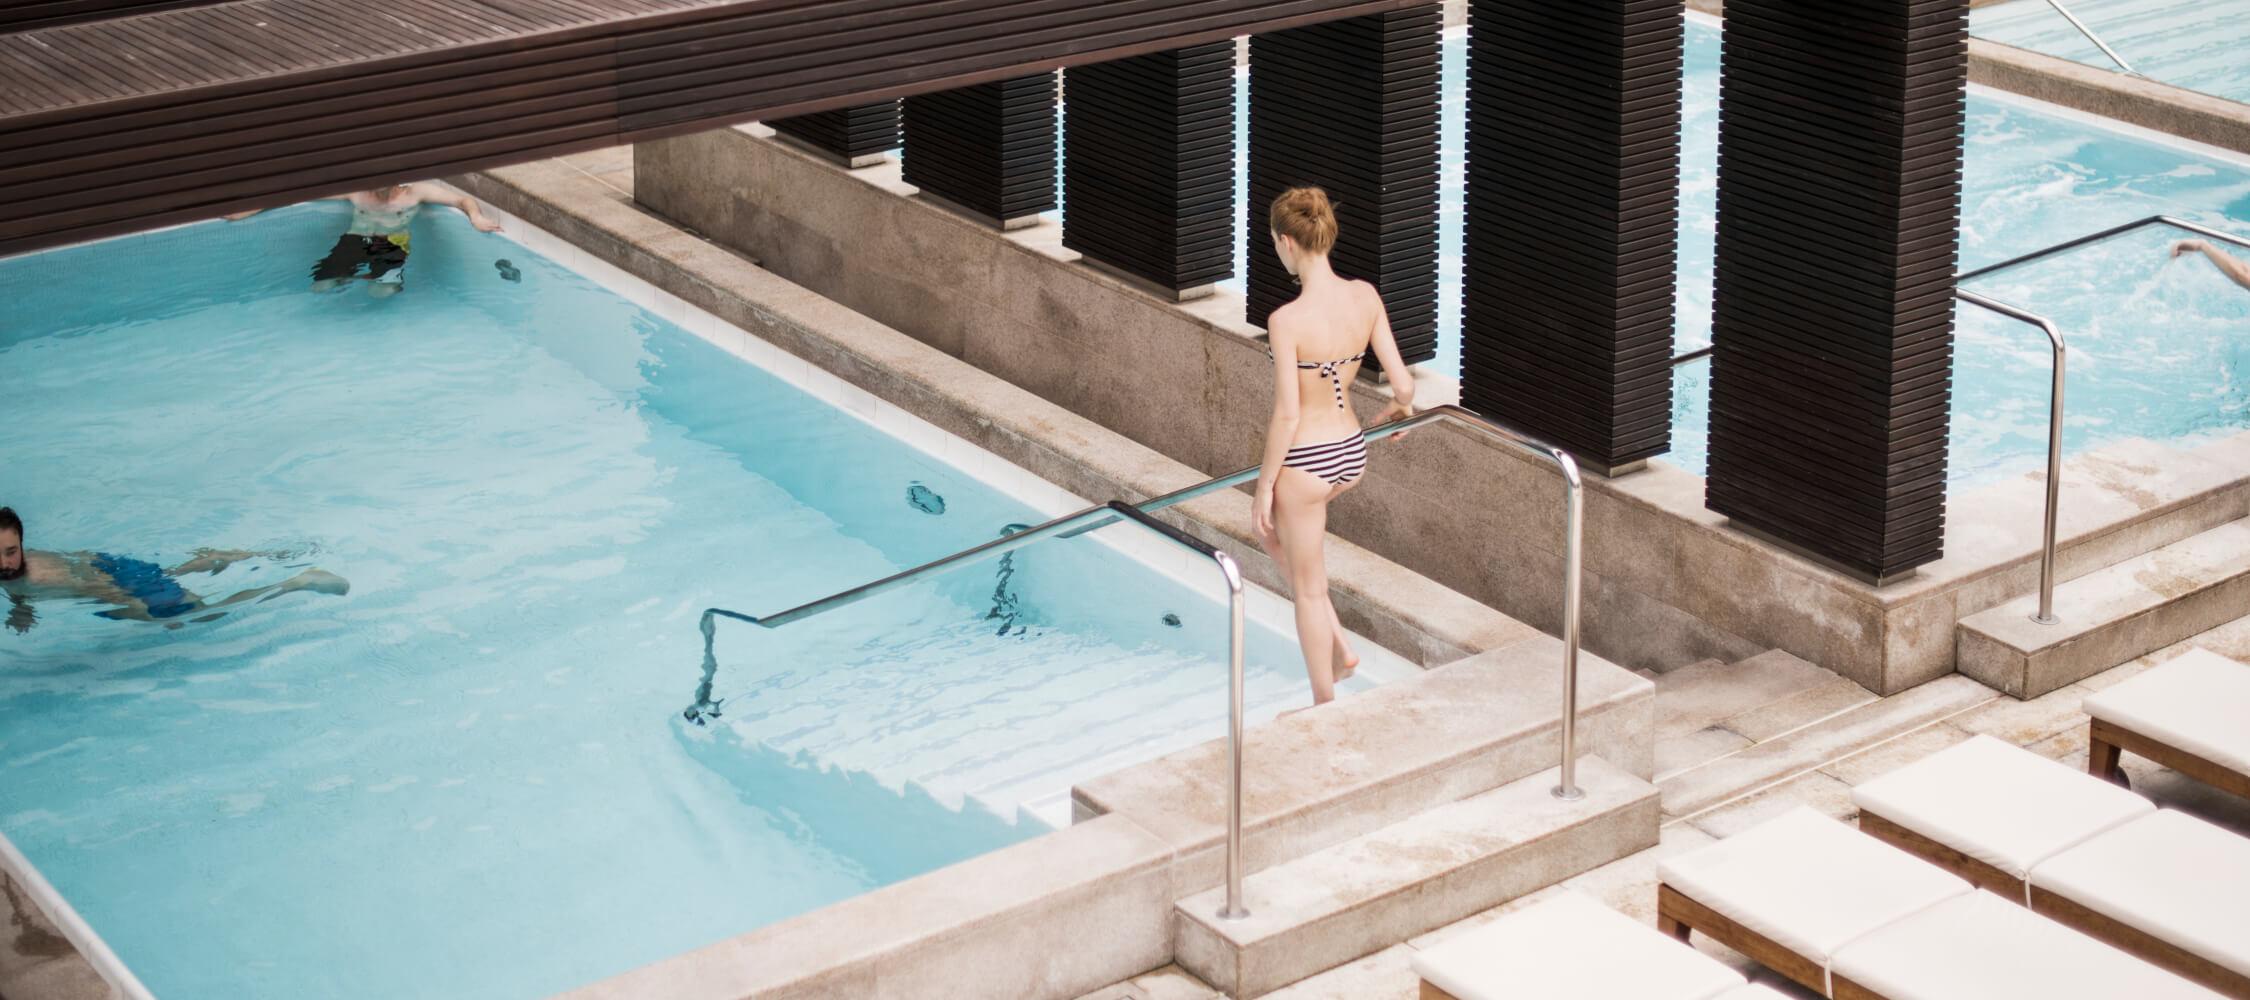 Italien-Trentino_Suedtirol_Alto_Adige_Merano_Meran_Therme_Pool_Badehalle_Schwimmbad_DSC4292_LucaMeneghel_2250x1000